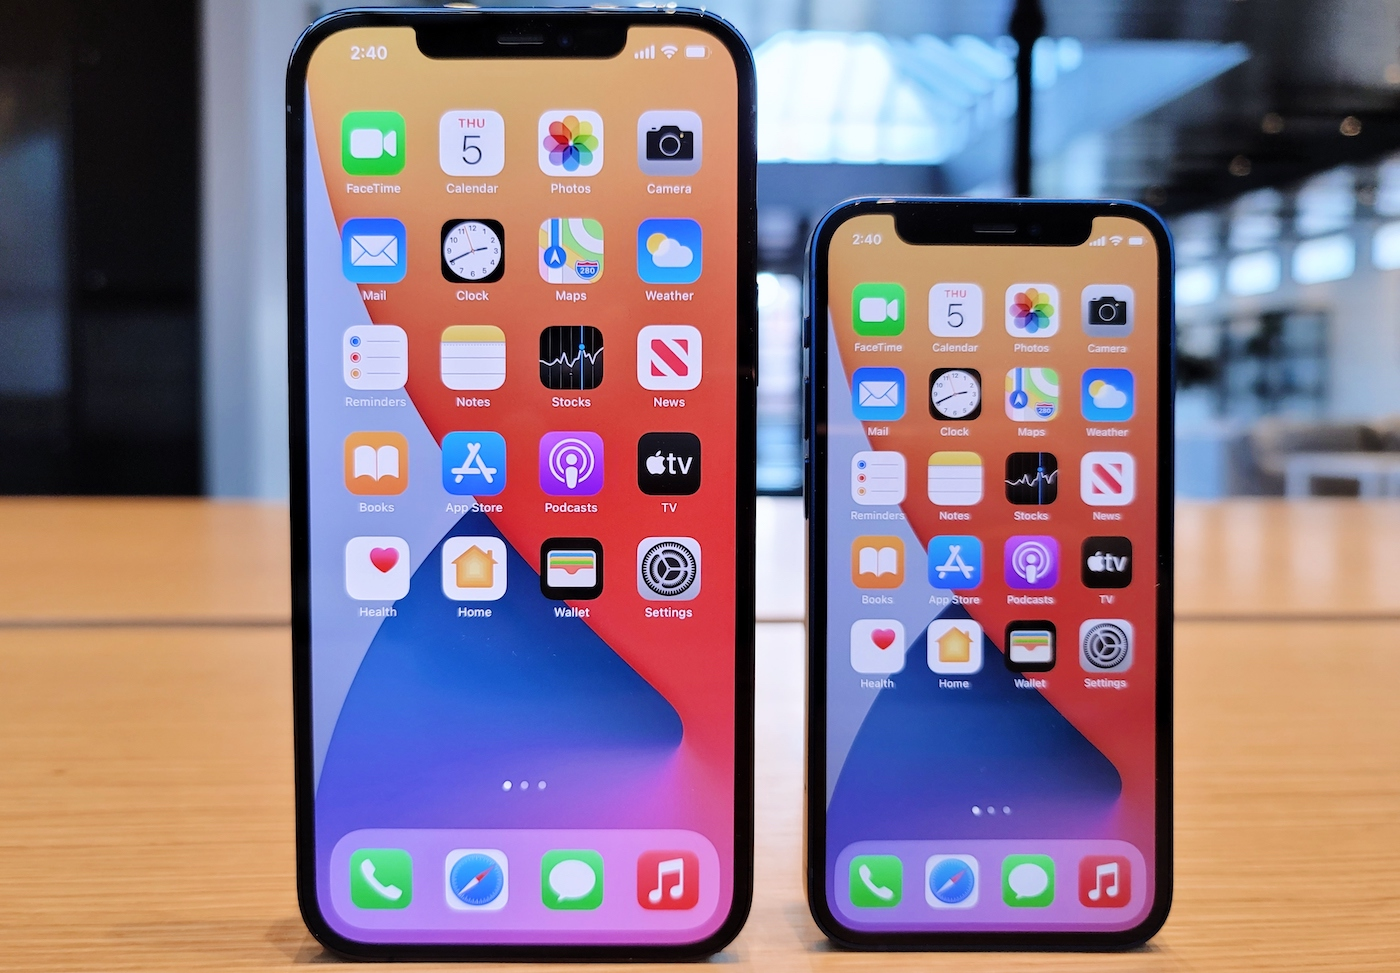 iPhone 12 Pro Max vs iPhone 12 mini - Les iPhone 12 mini et iPhone 12 Pro Max sont disponibles à l'achat